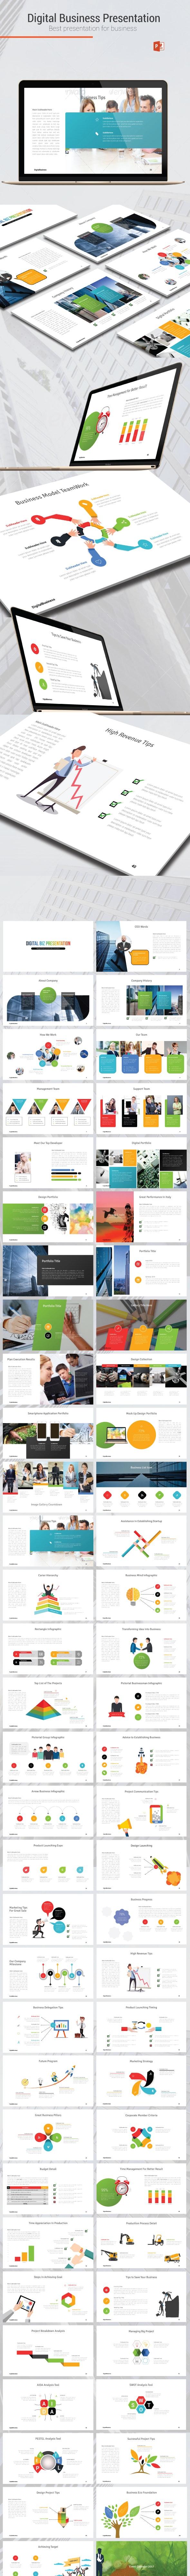 Digital Business Presentation - Business PowerPoint Templates